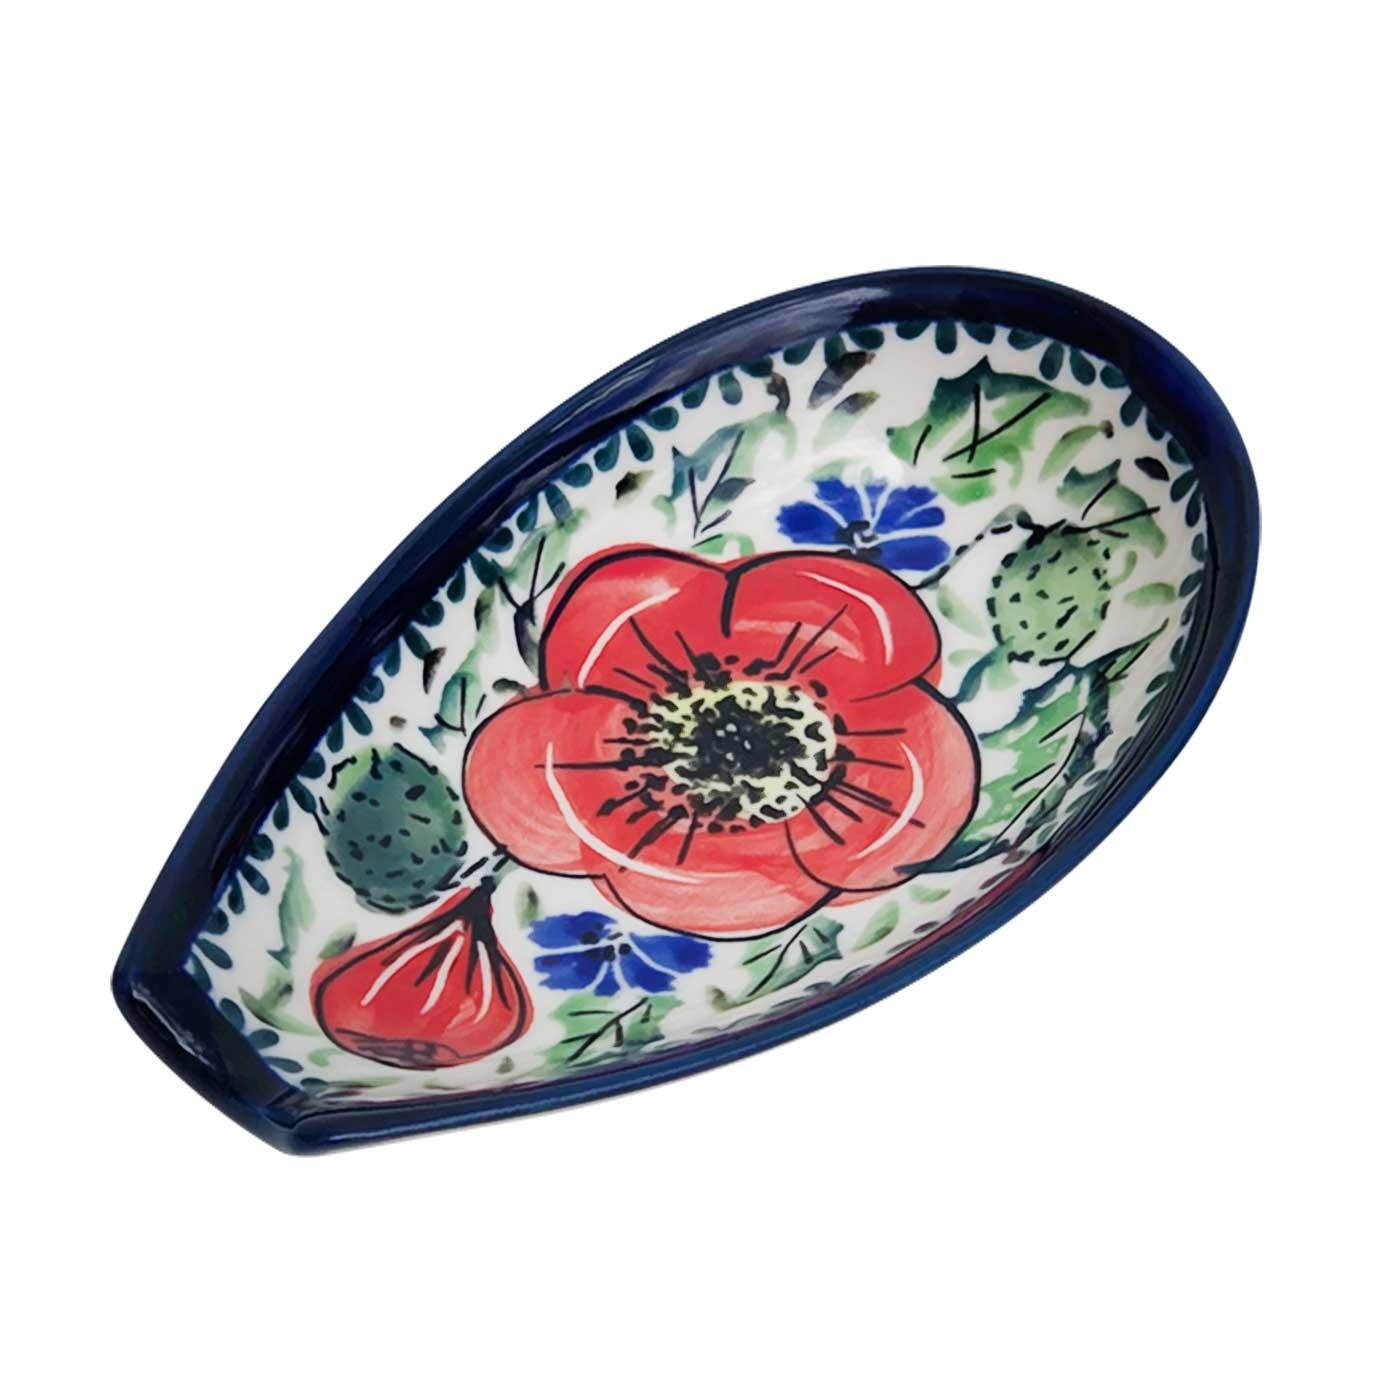 "Pottery Avenue 5"" Stoneware Spoon Rest - 1015-252EX Bellissima"